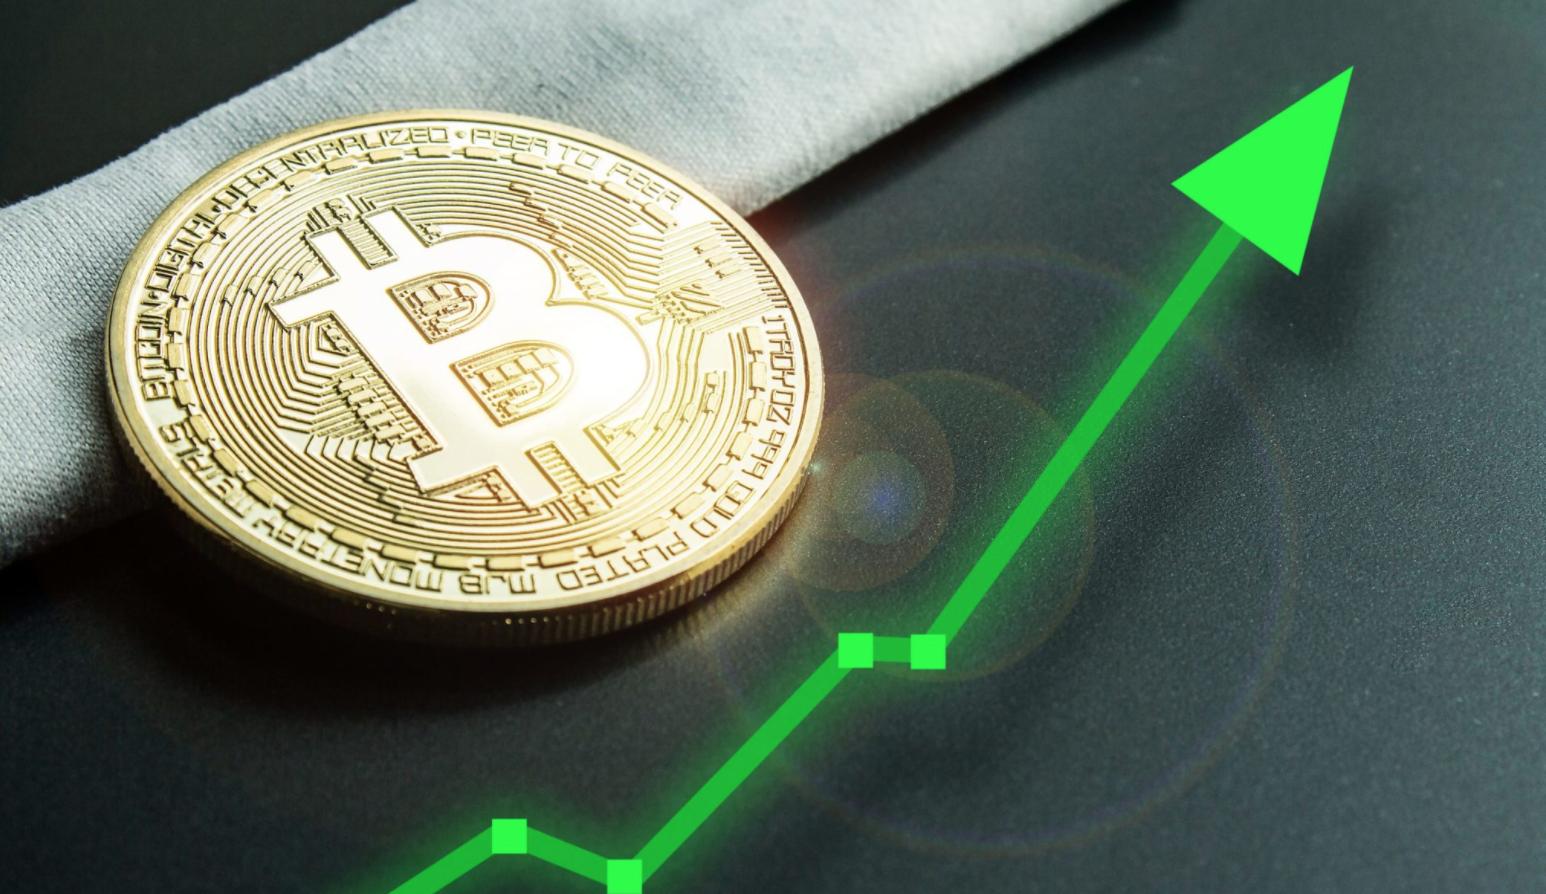 Crypto koersen herstellen na flashcrash